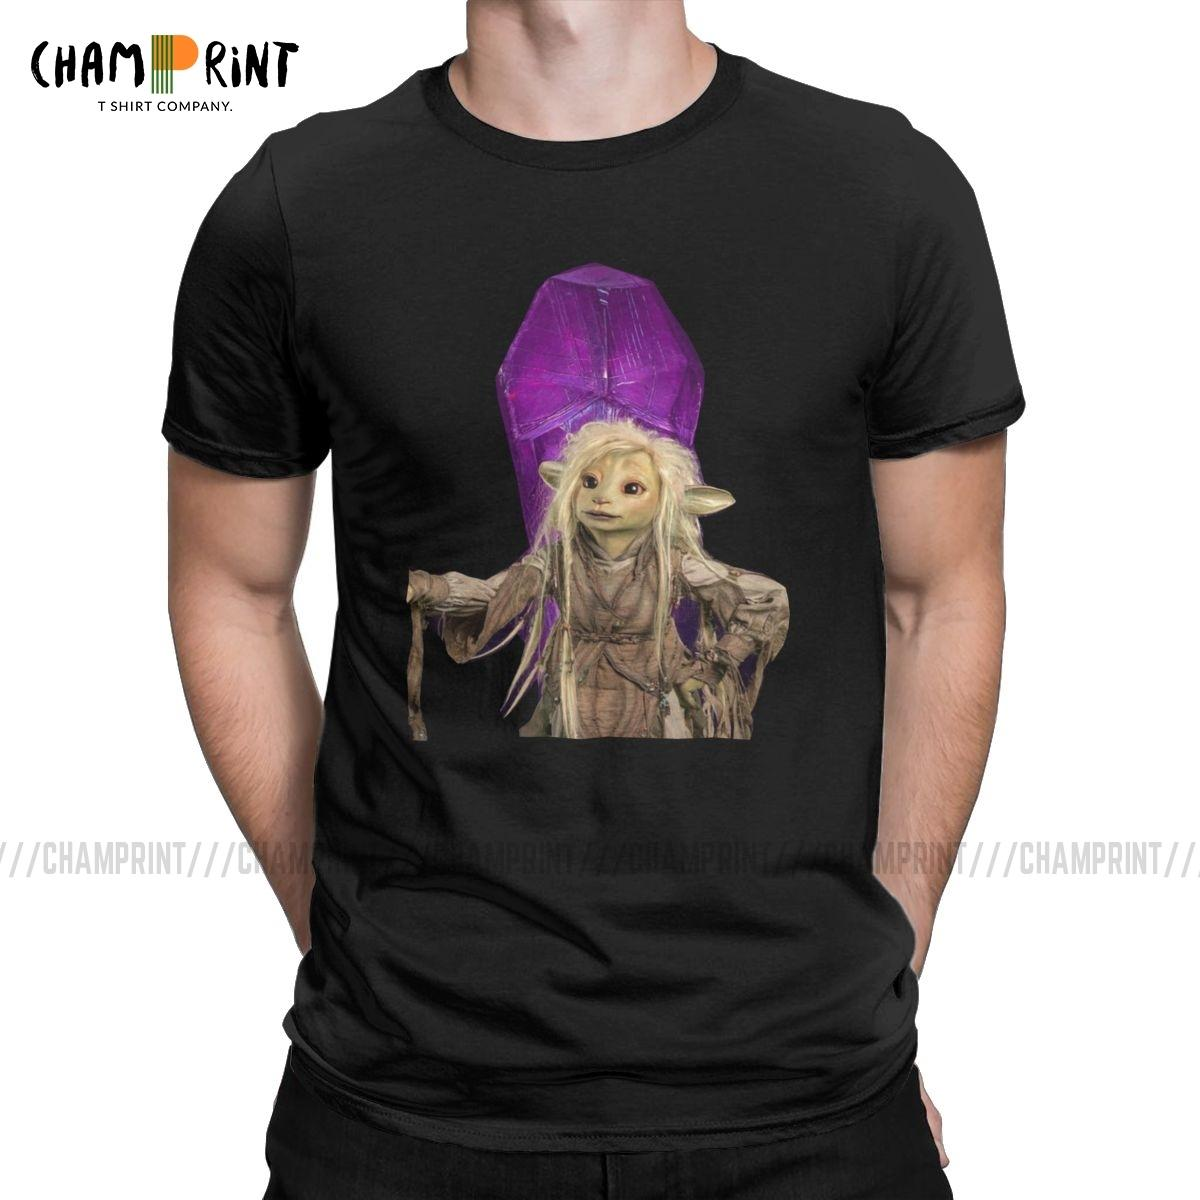 Homens Deet A Dark Crystal camisetas Fantasia Filme do vintage camiseta T-shirt gola redonda Short Sleeve Cotton Plus Size Clothes